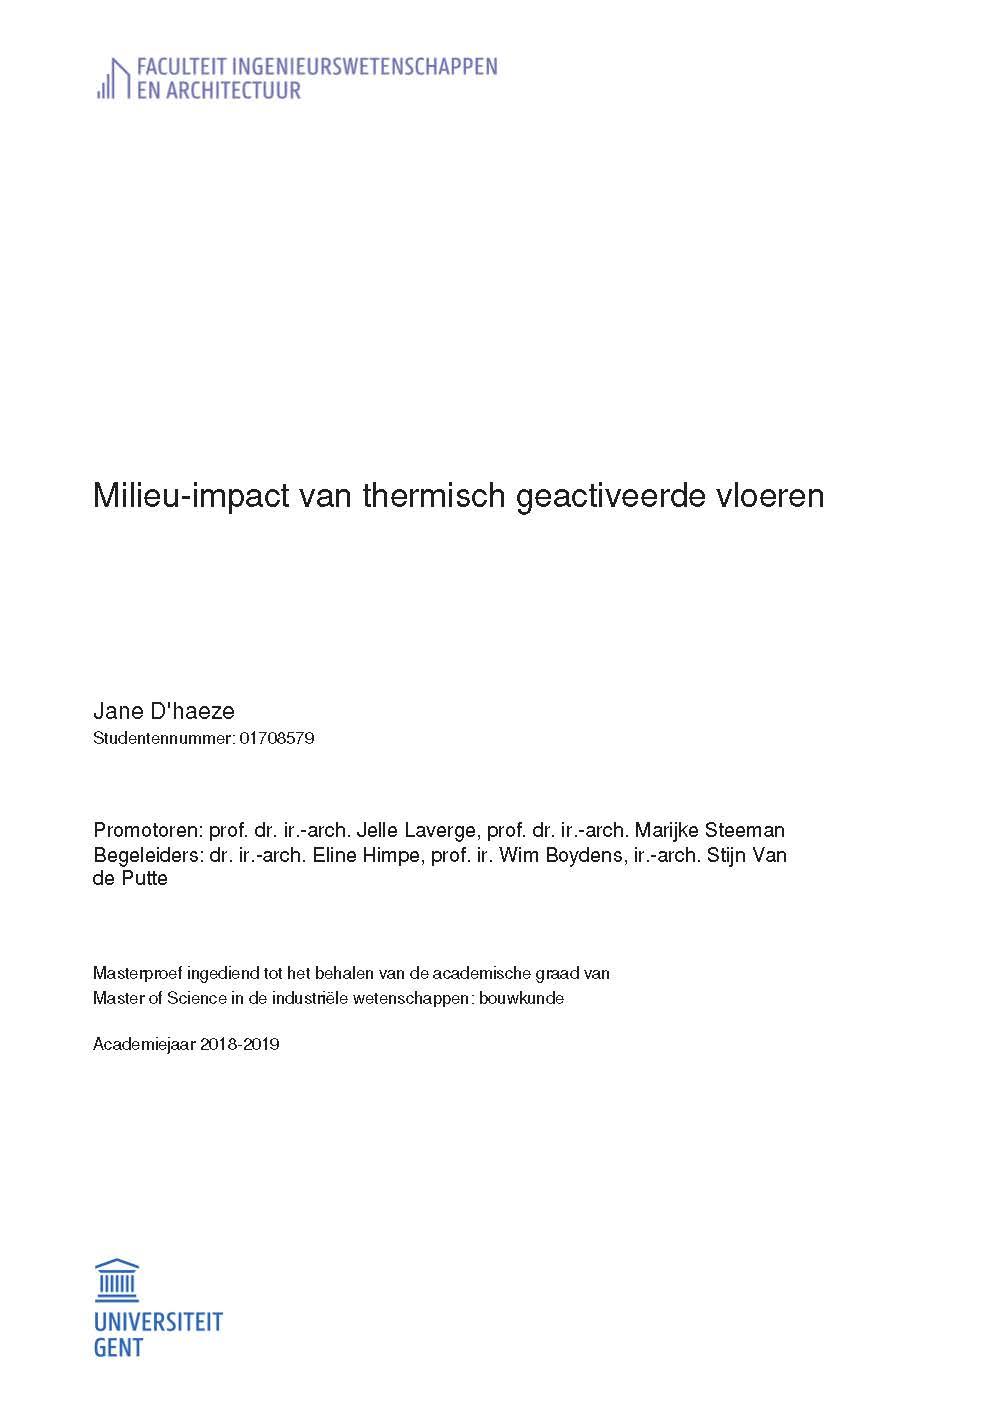 Jane D haeze cover